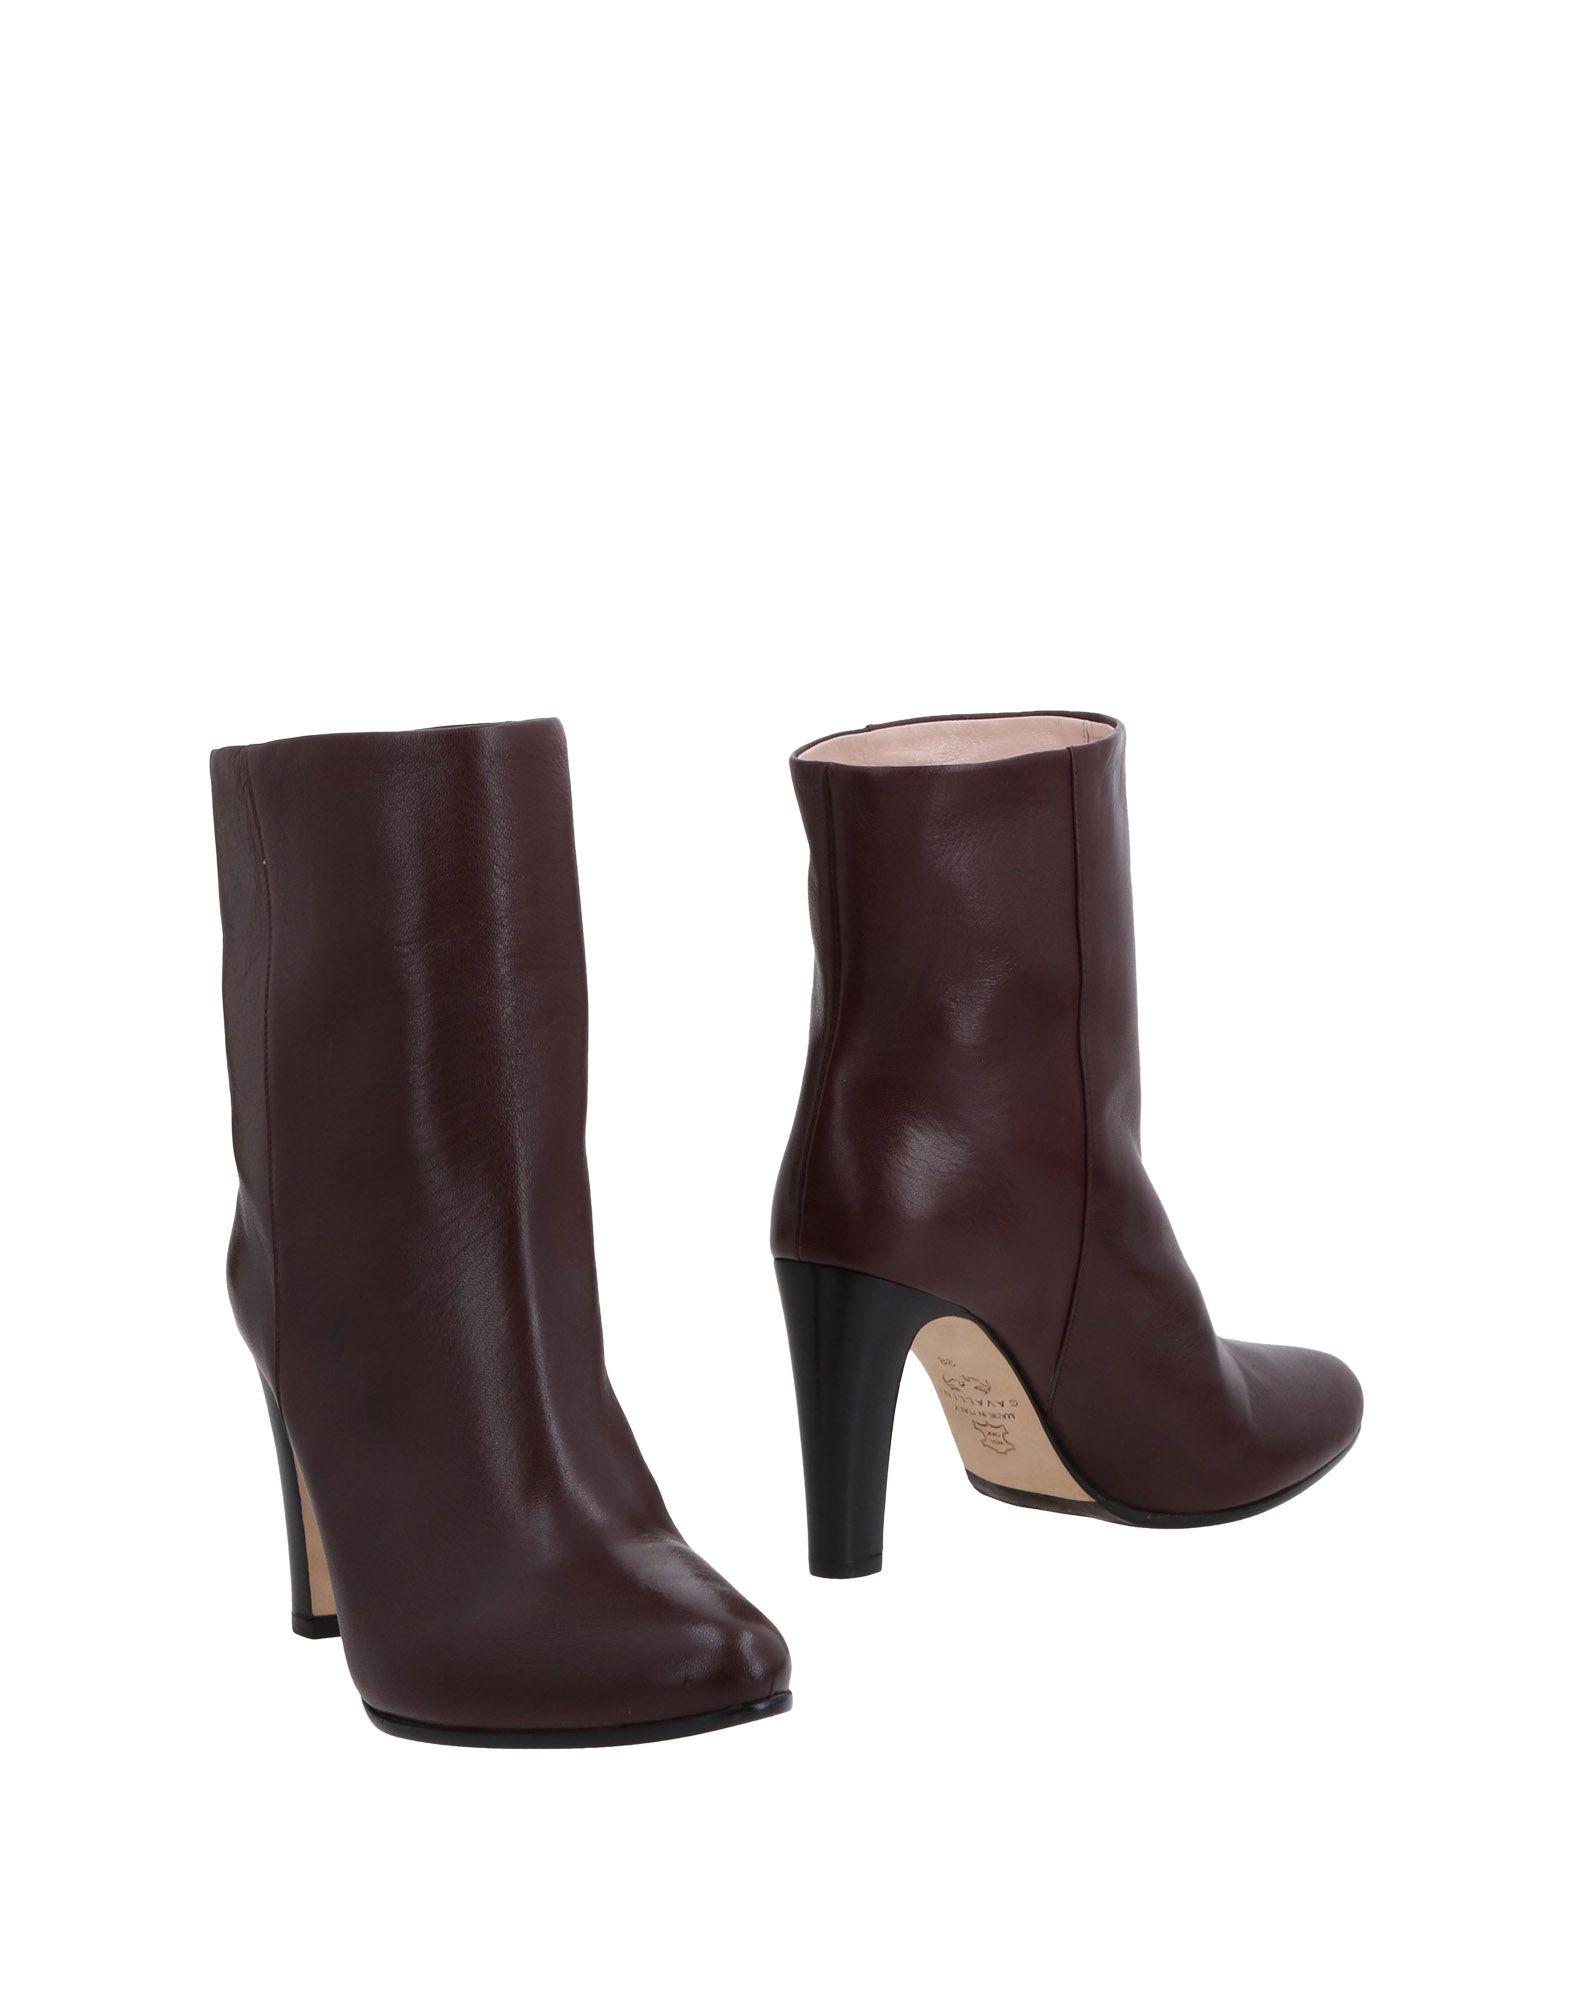 Cavallini Stiefelette strapazierfähige Damen  11483109NFGut aussehende strapazierfähige Stiefelette Schuhe 462bac